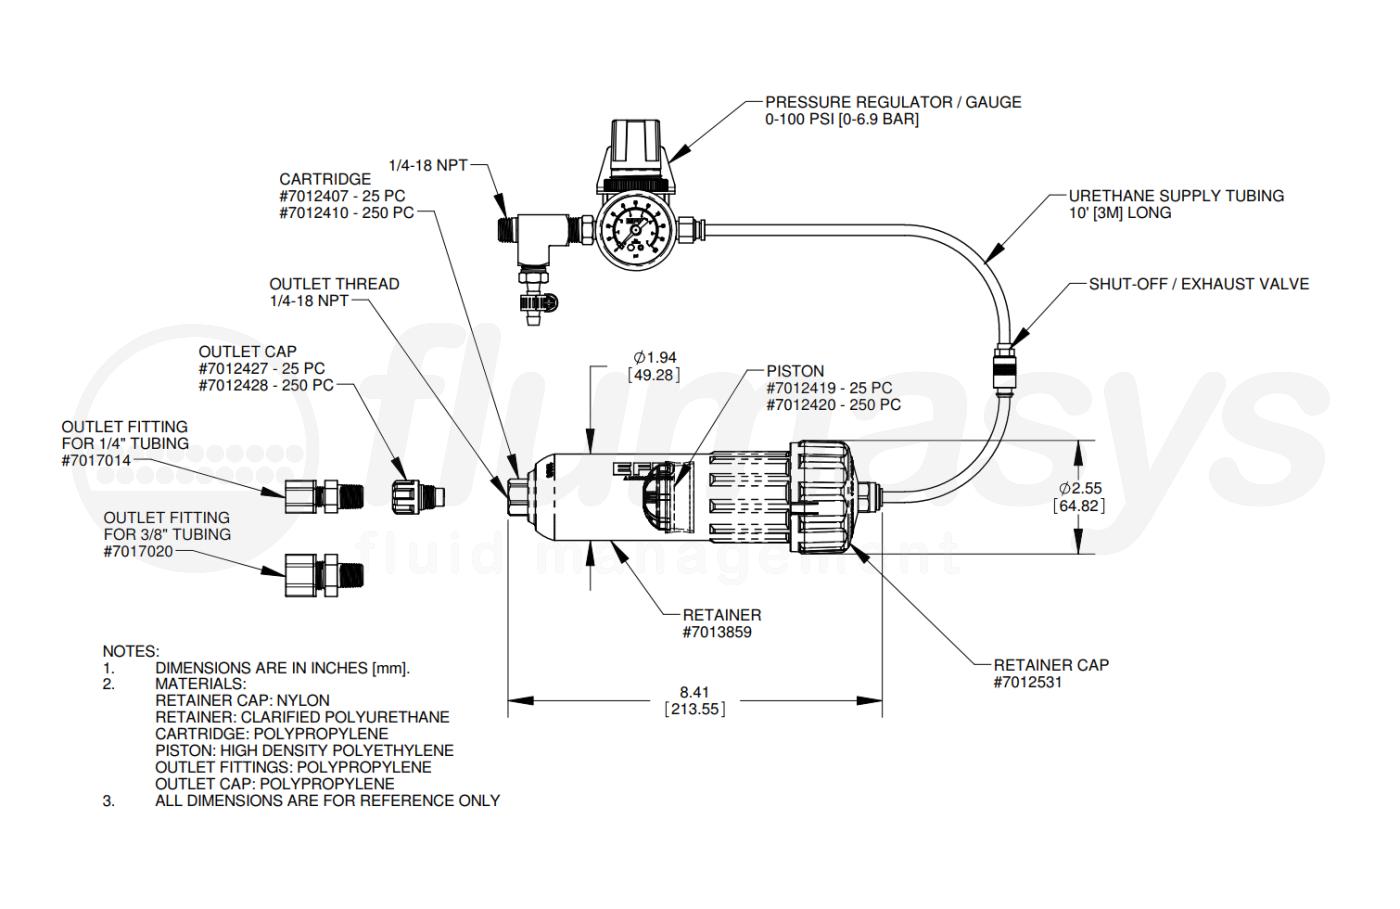 7012435_NordsonEFD_Optimum_retainer_system_6OZ_0-7bar_drawing